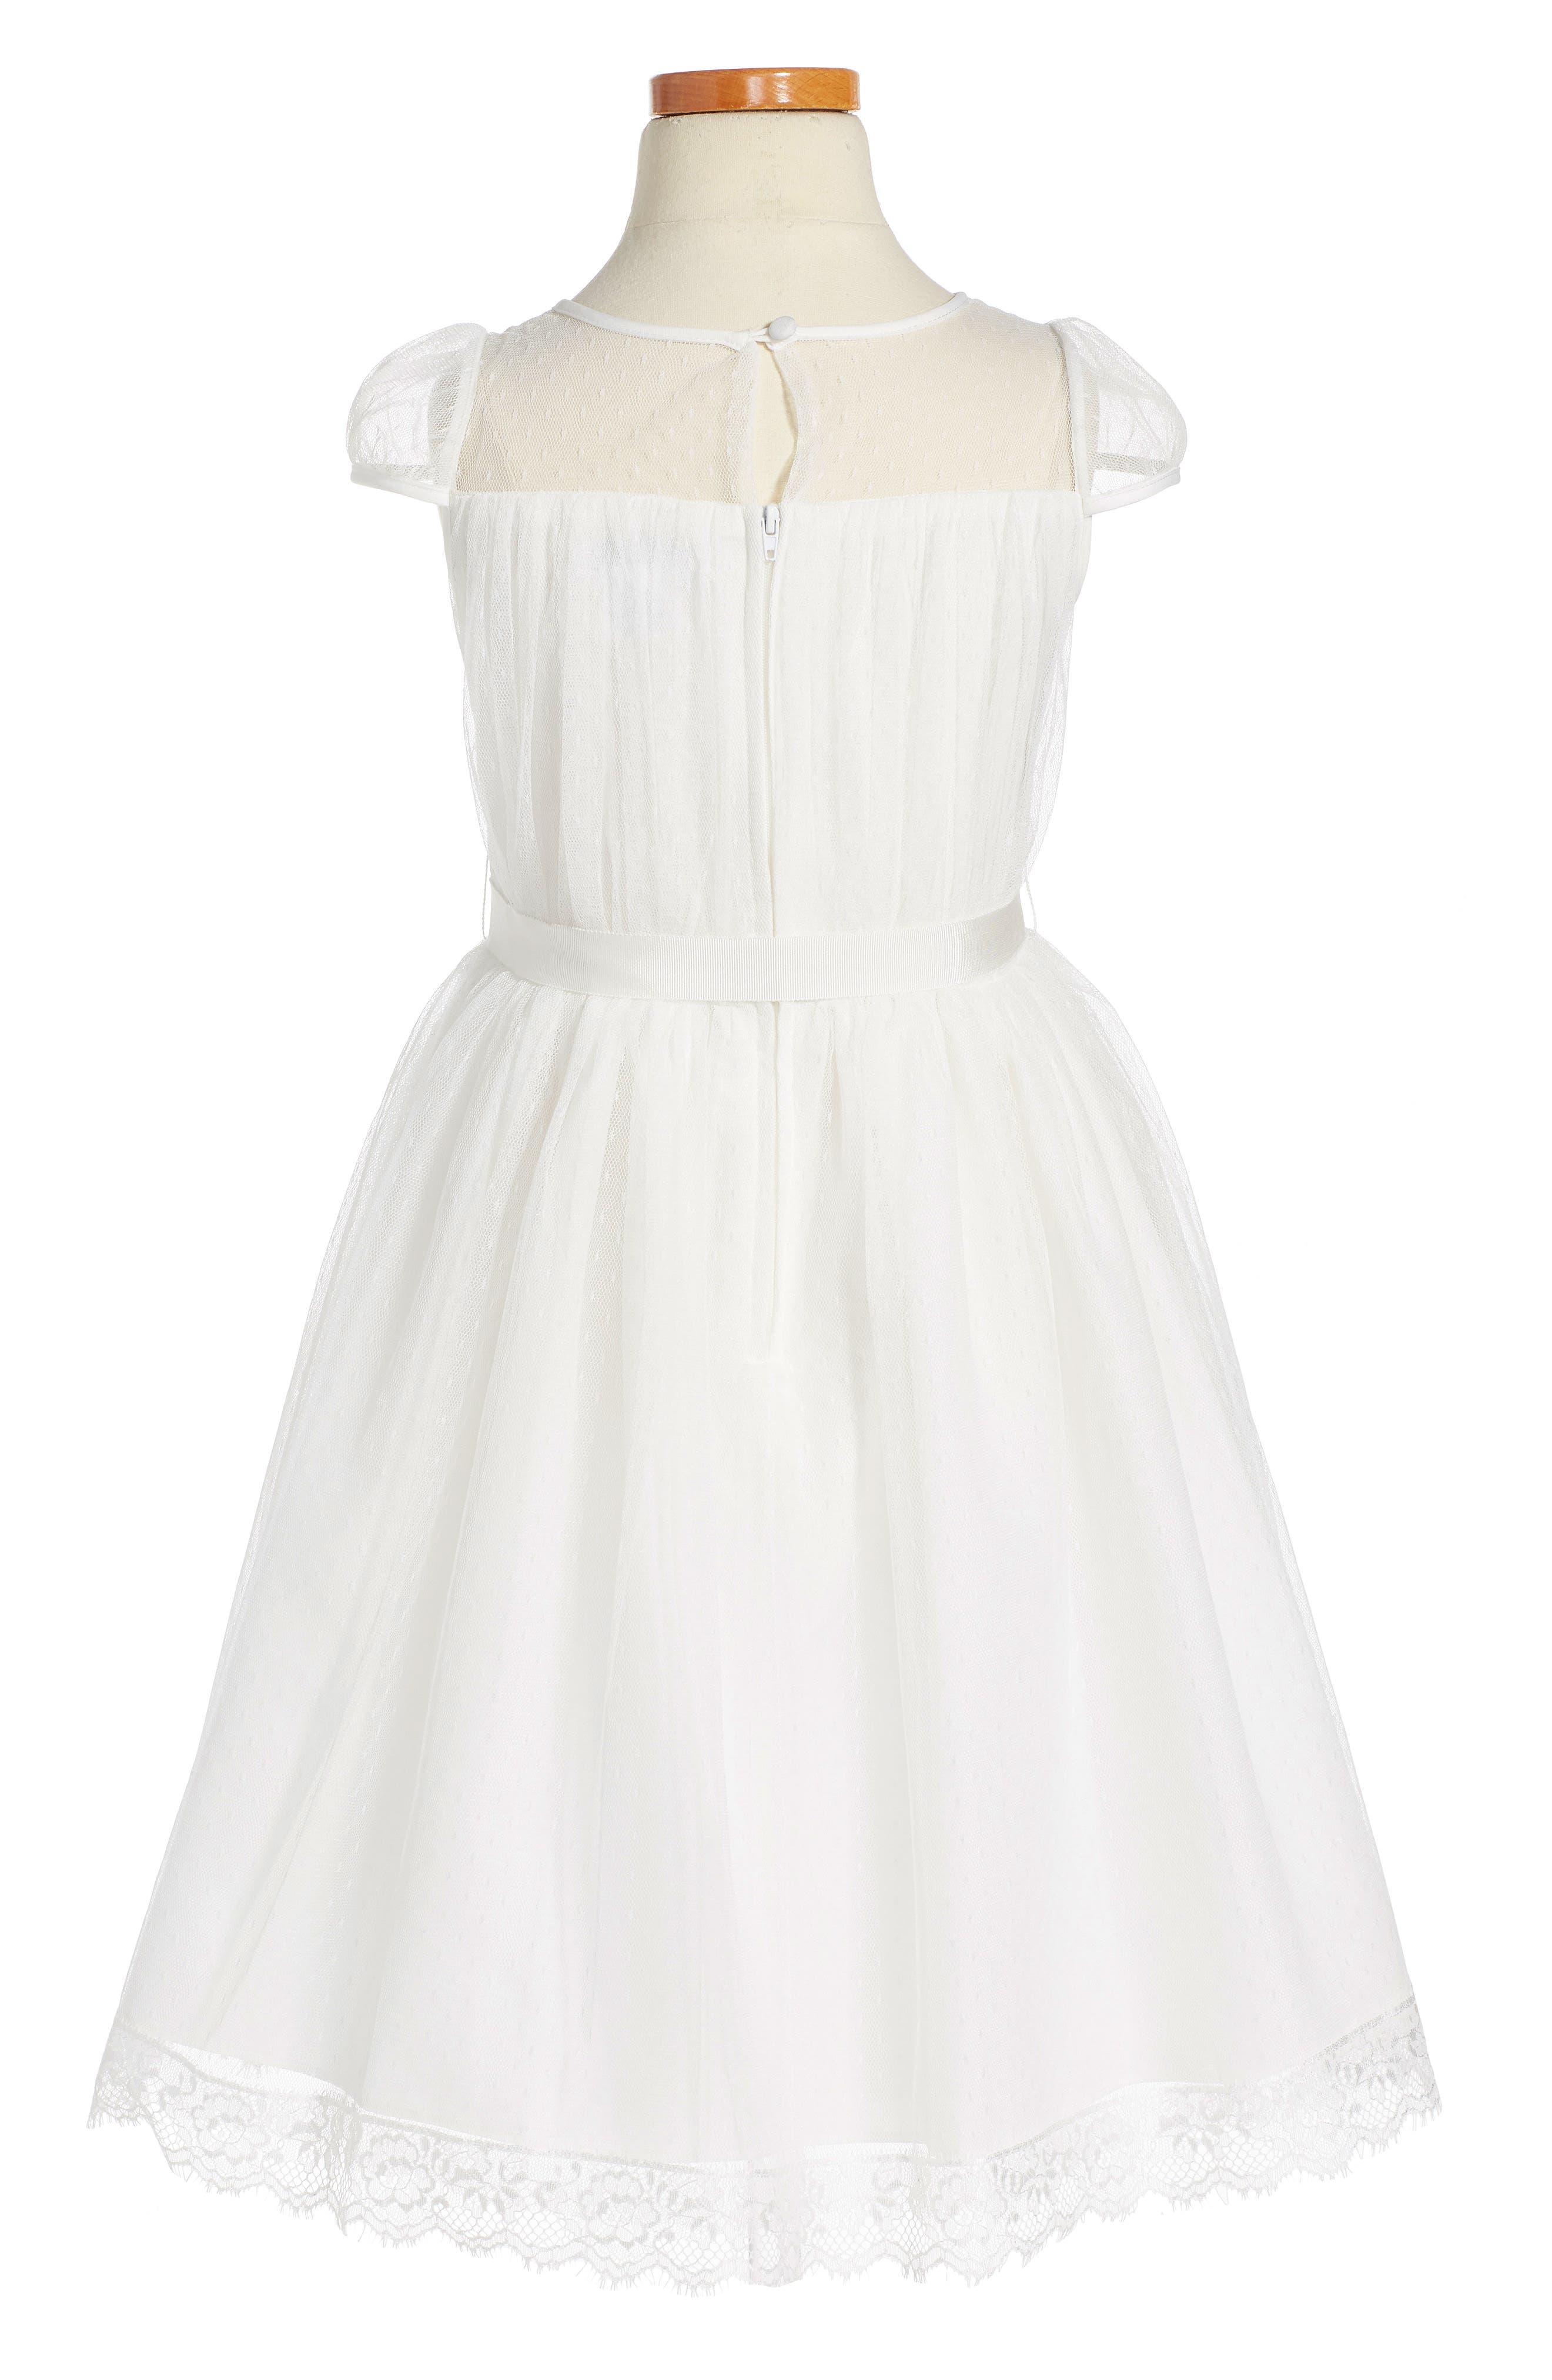 Alternate Image 2  - Us Angels Point d'Esprit Dress (Toddler Girls, Little Girls & Big Girls)